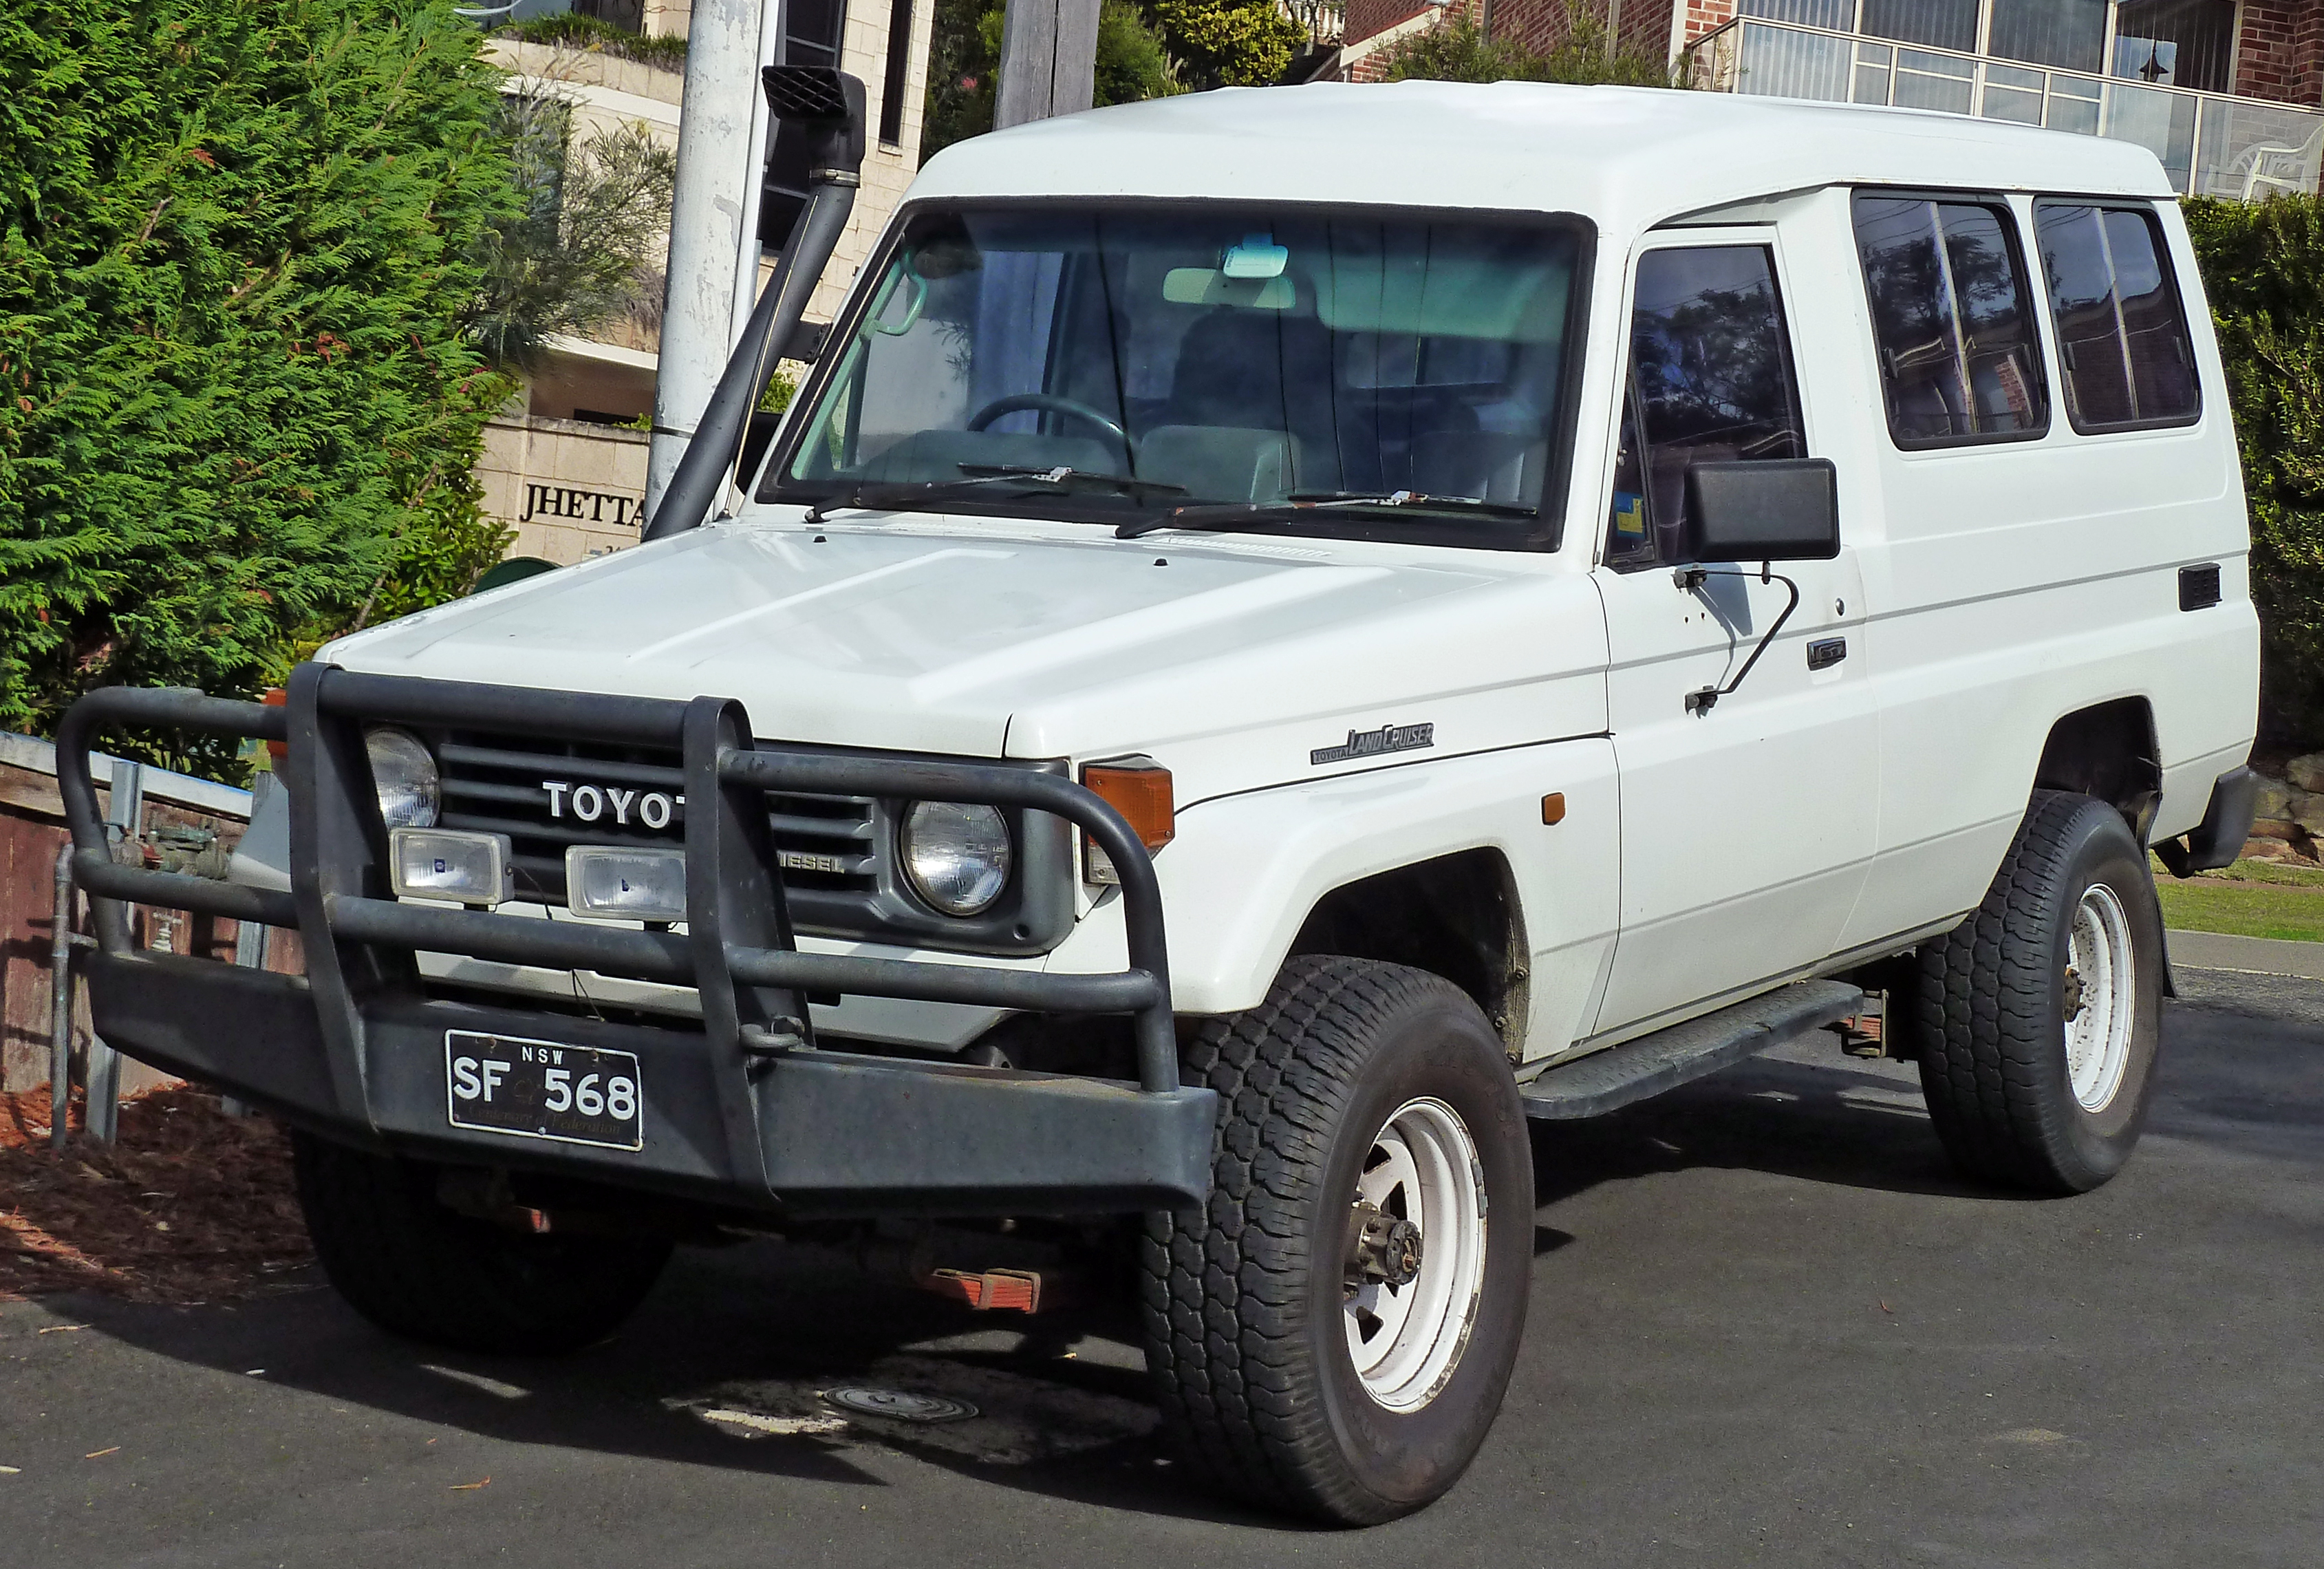 file 1991 toyota land cruiser hzj75rv 3 door wagon 2010. Black Bedroom Furniture Sets. Home Design Ideas